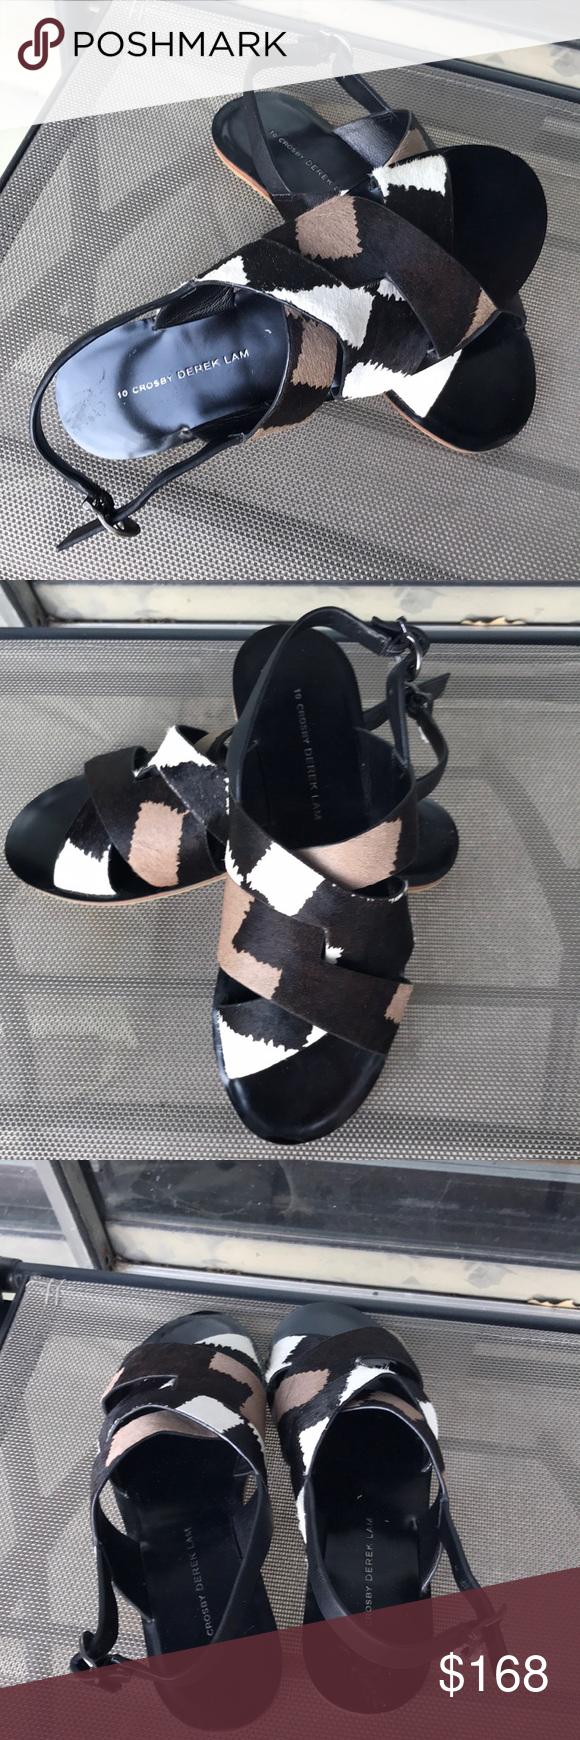 10 Crosby Derek Lam Strap Flat Sandals Nwot Derek Lam Shoes Clothes Design Fashion Design